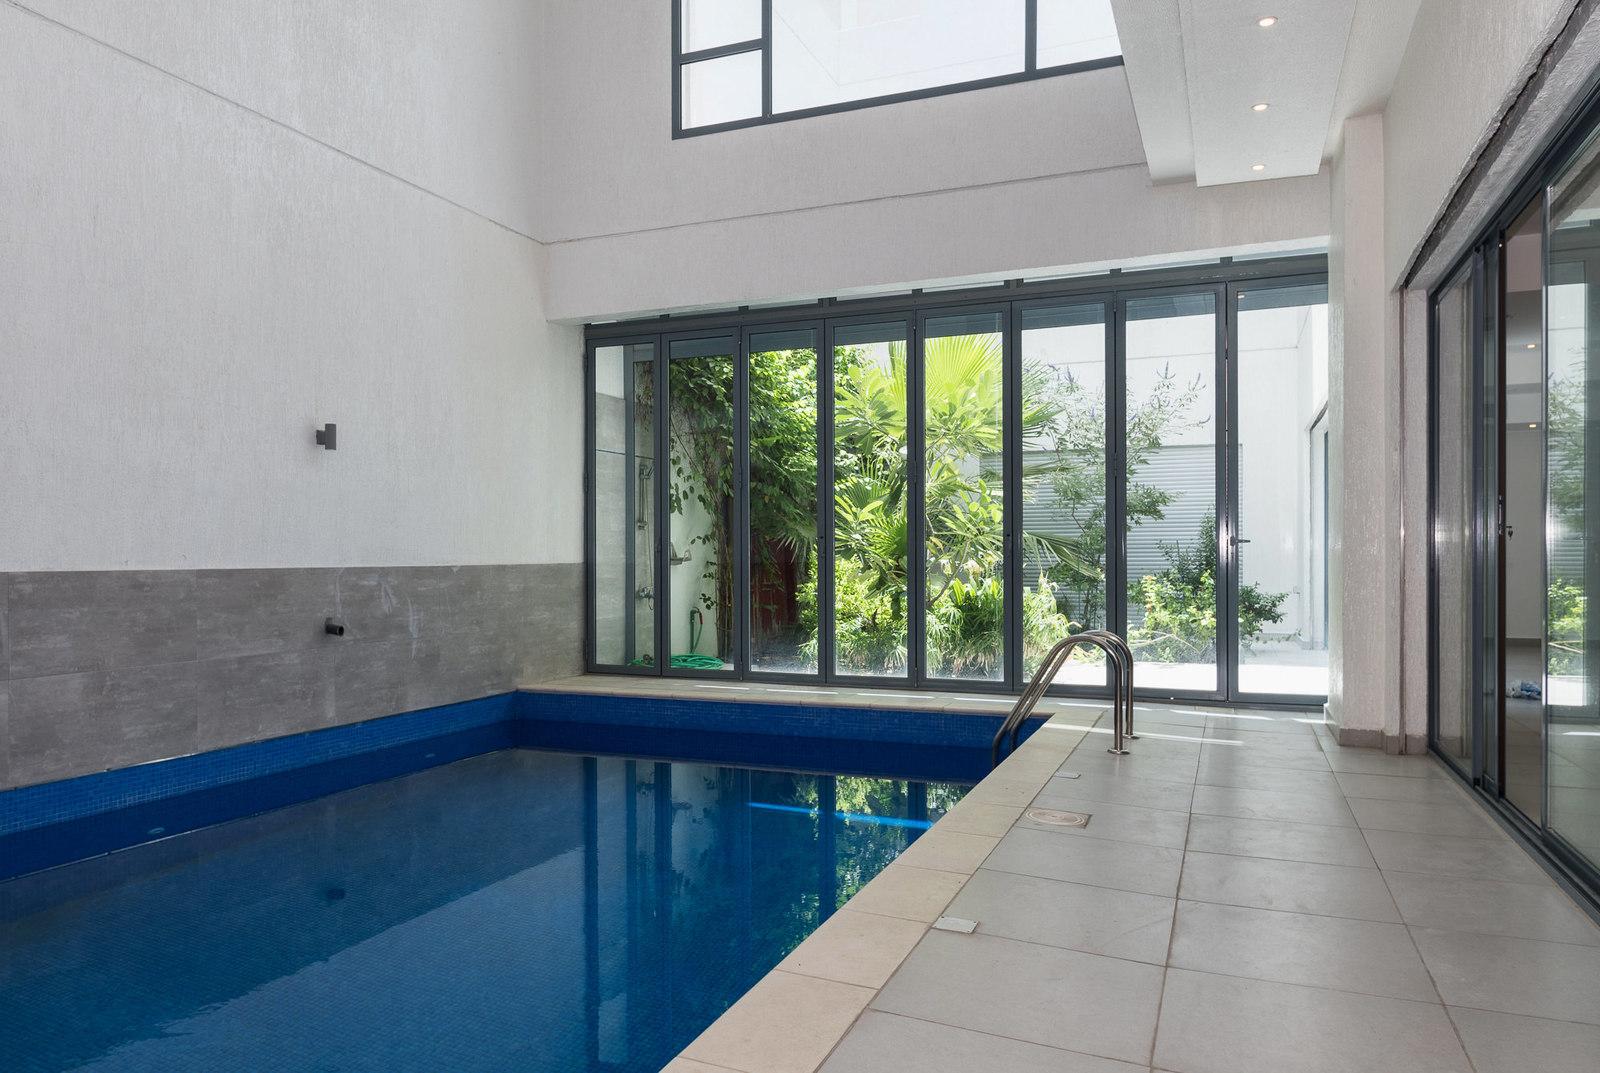 Abu Fatira – unfurnished, three bedroom basement w/private pool